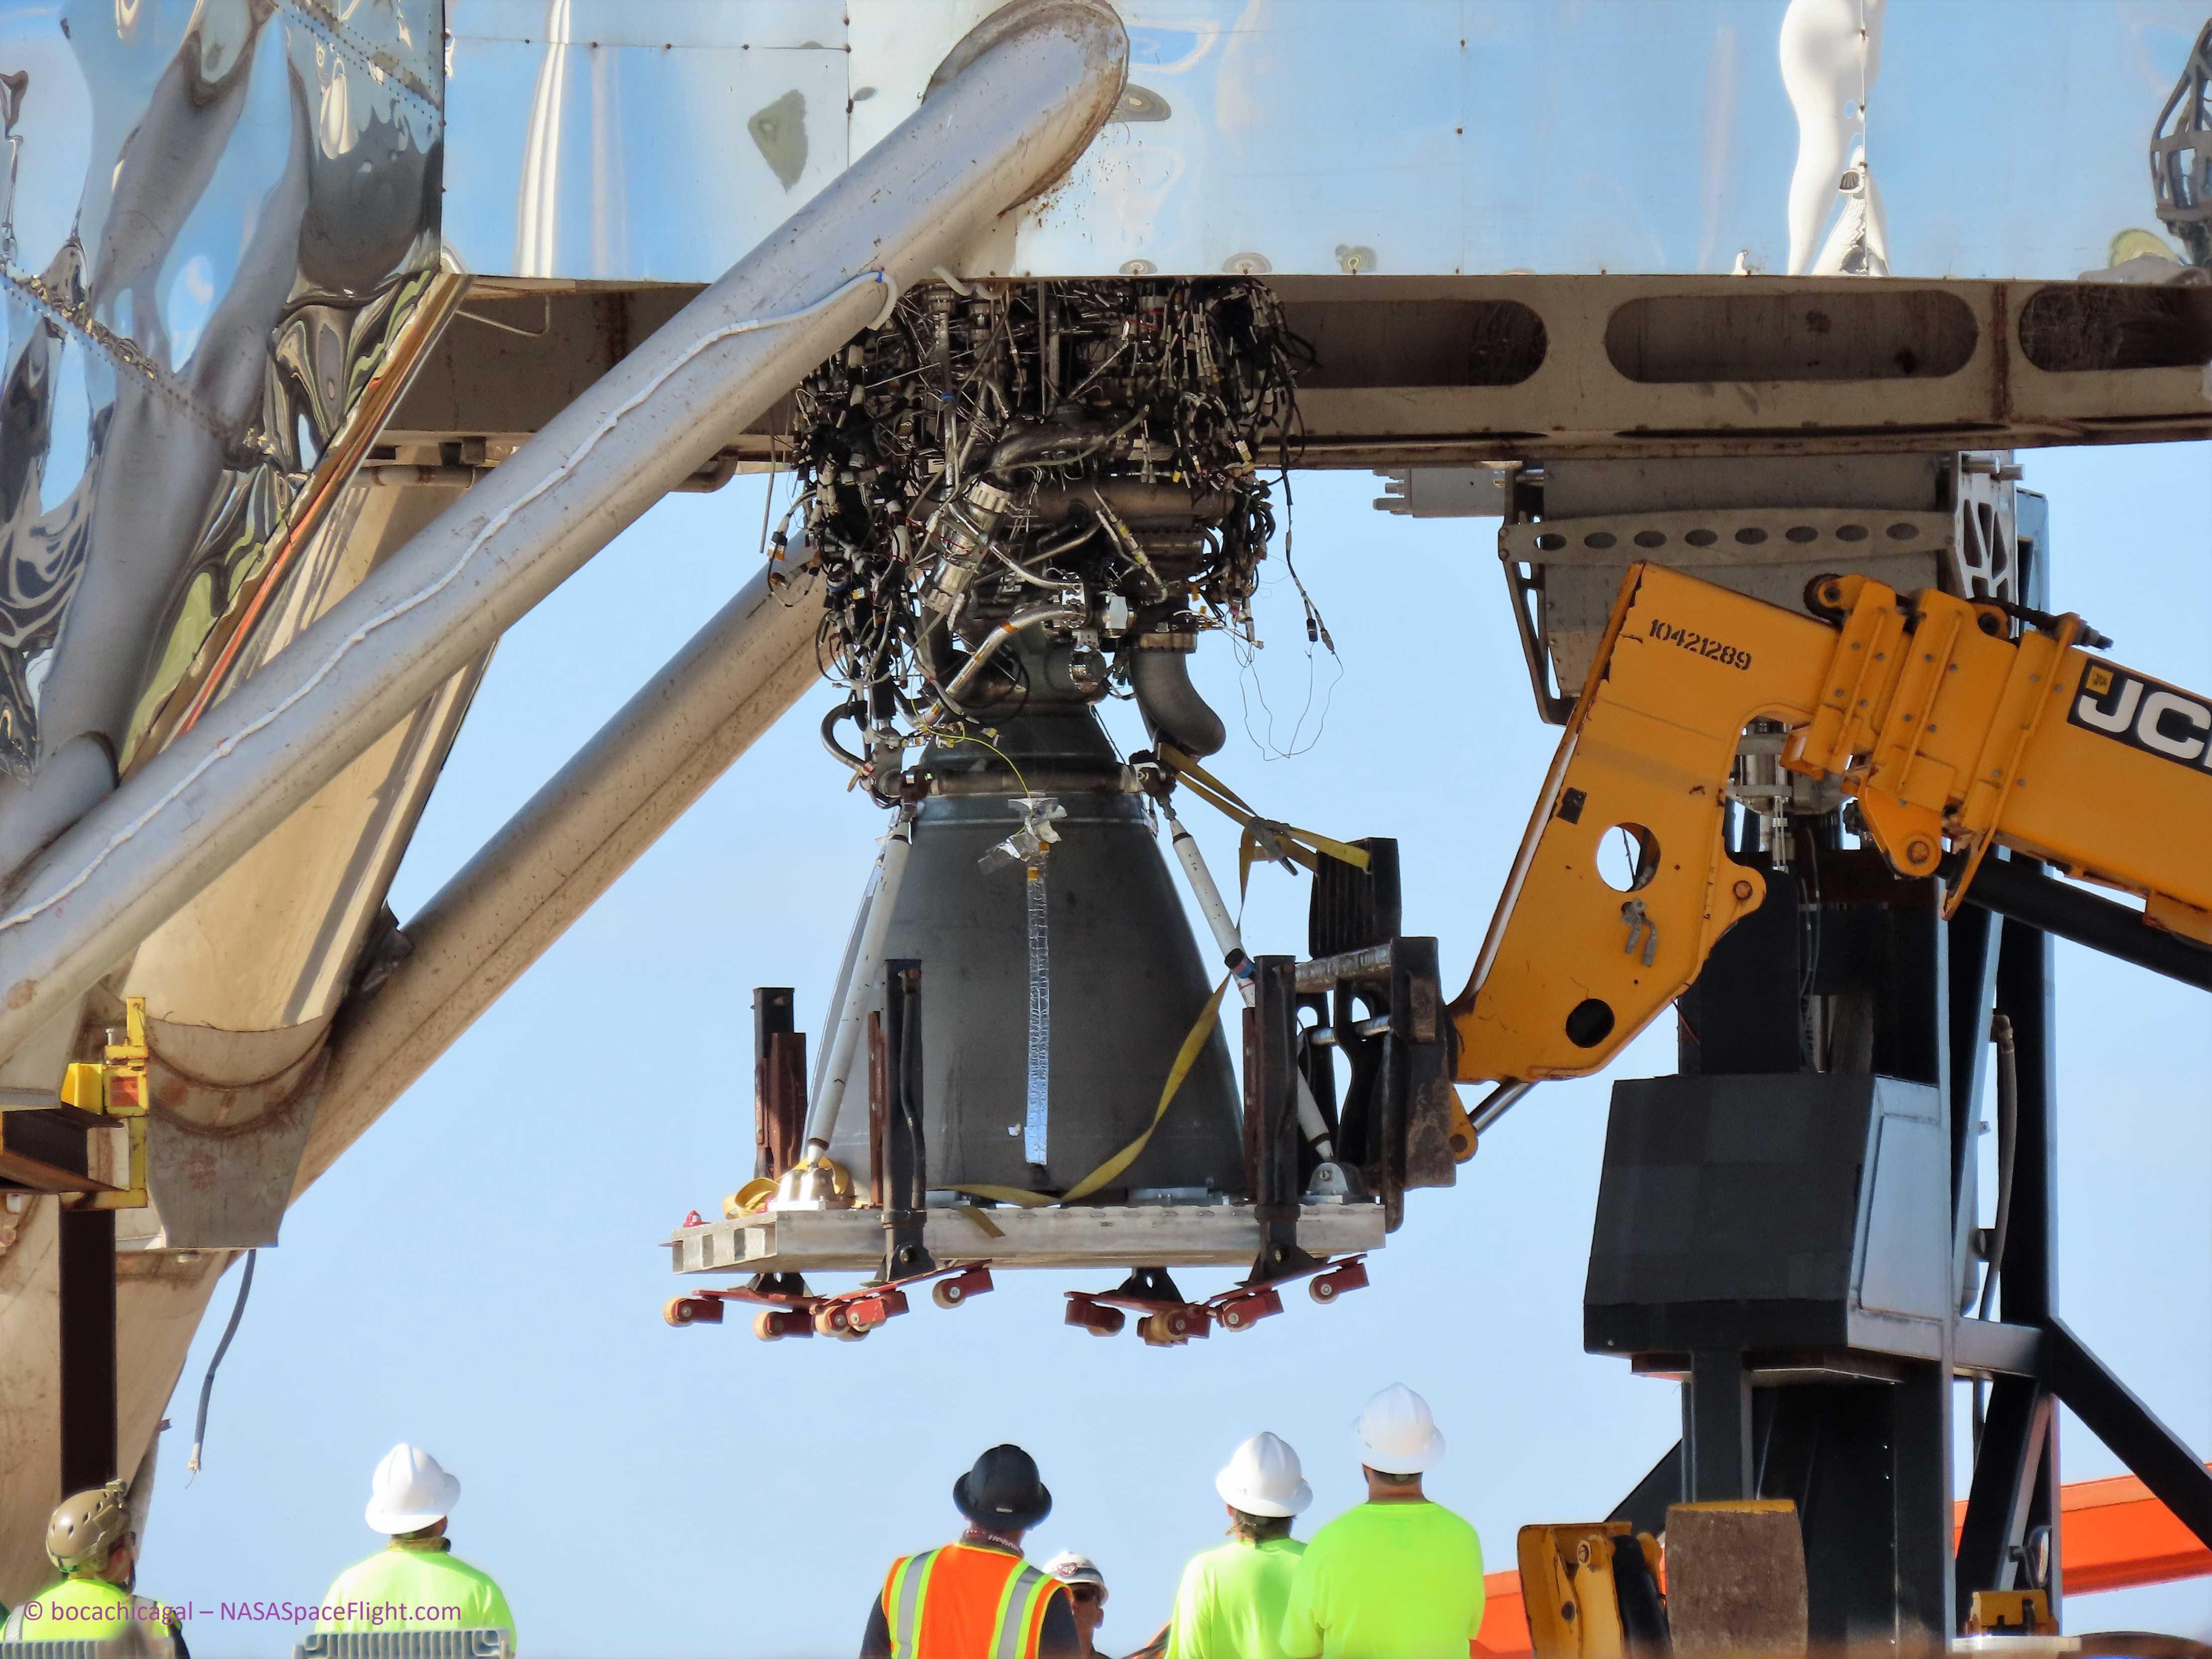 Boca Chica Starhopper Raptor SN06 installation 071119 (NASASpaceflight- bocachicagal) 1 (c)